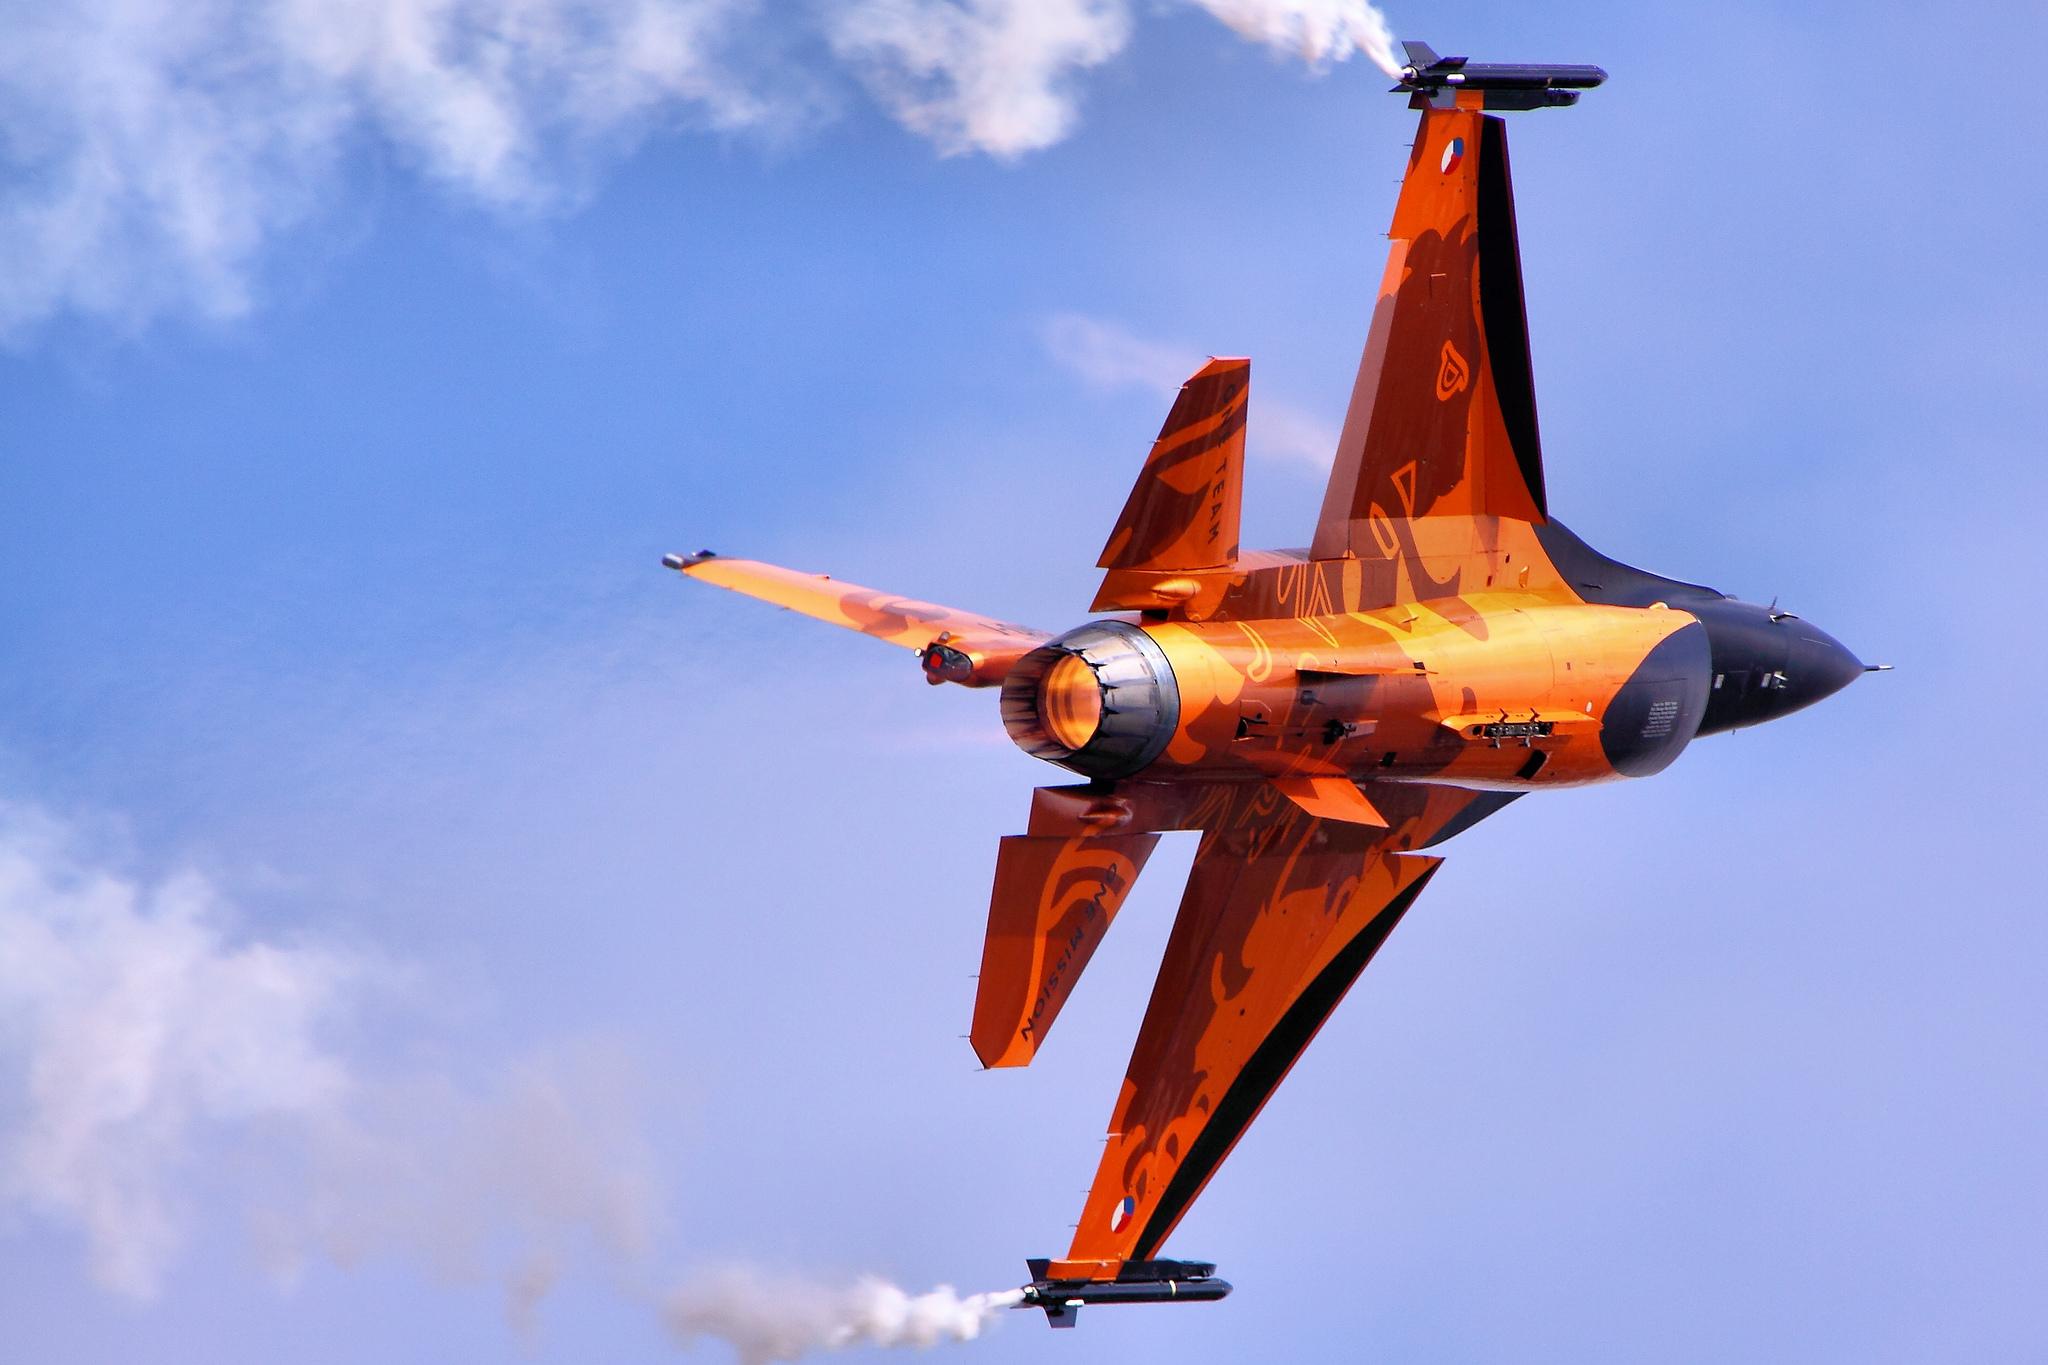 авиация самолет желтый F-16 Fighting Falcon  № 3755617 без смс